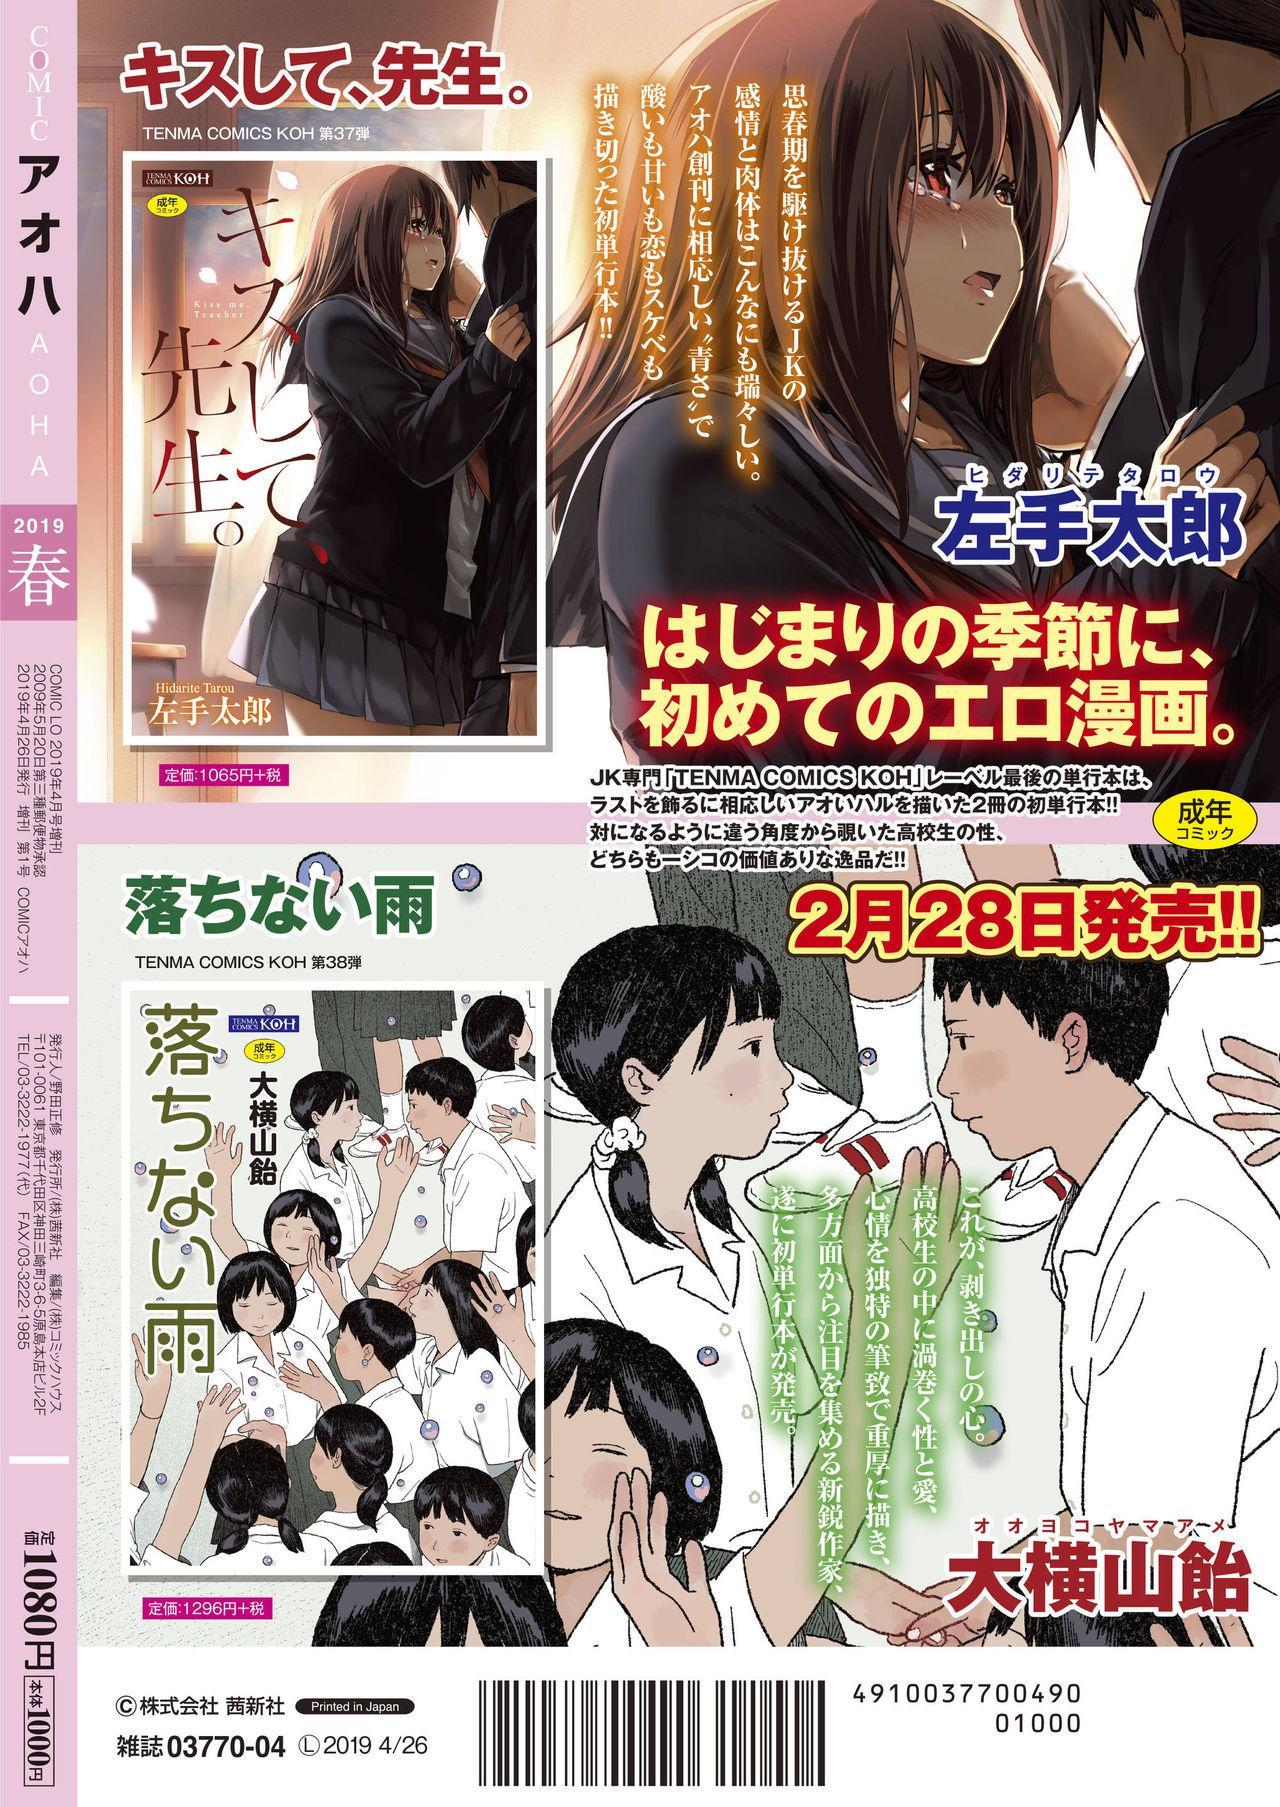 COMIC AOHA 2019 Haru 491